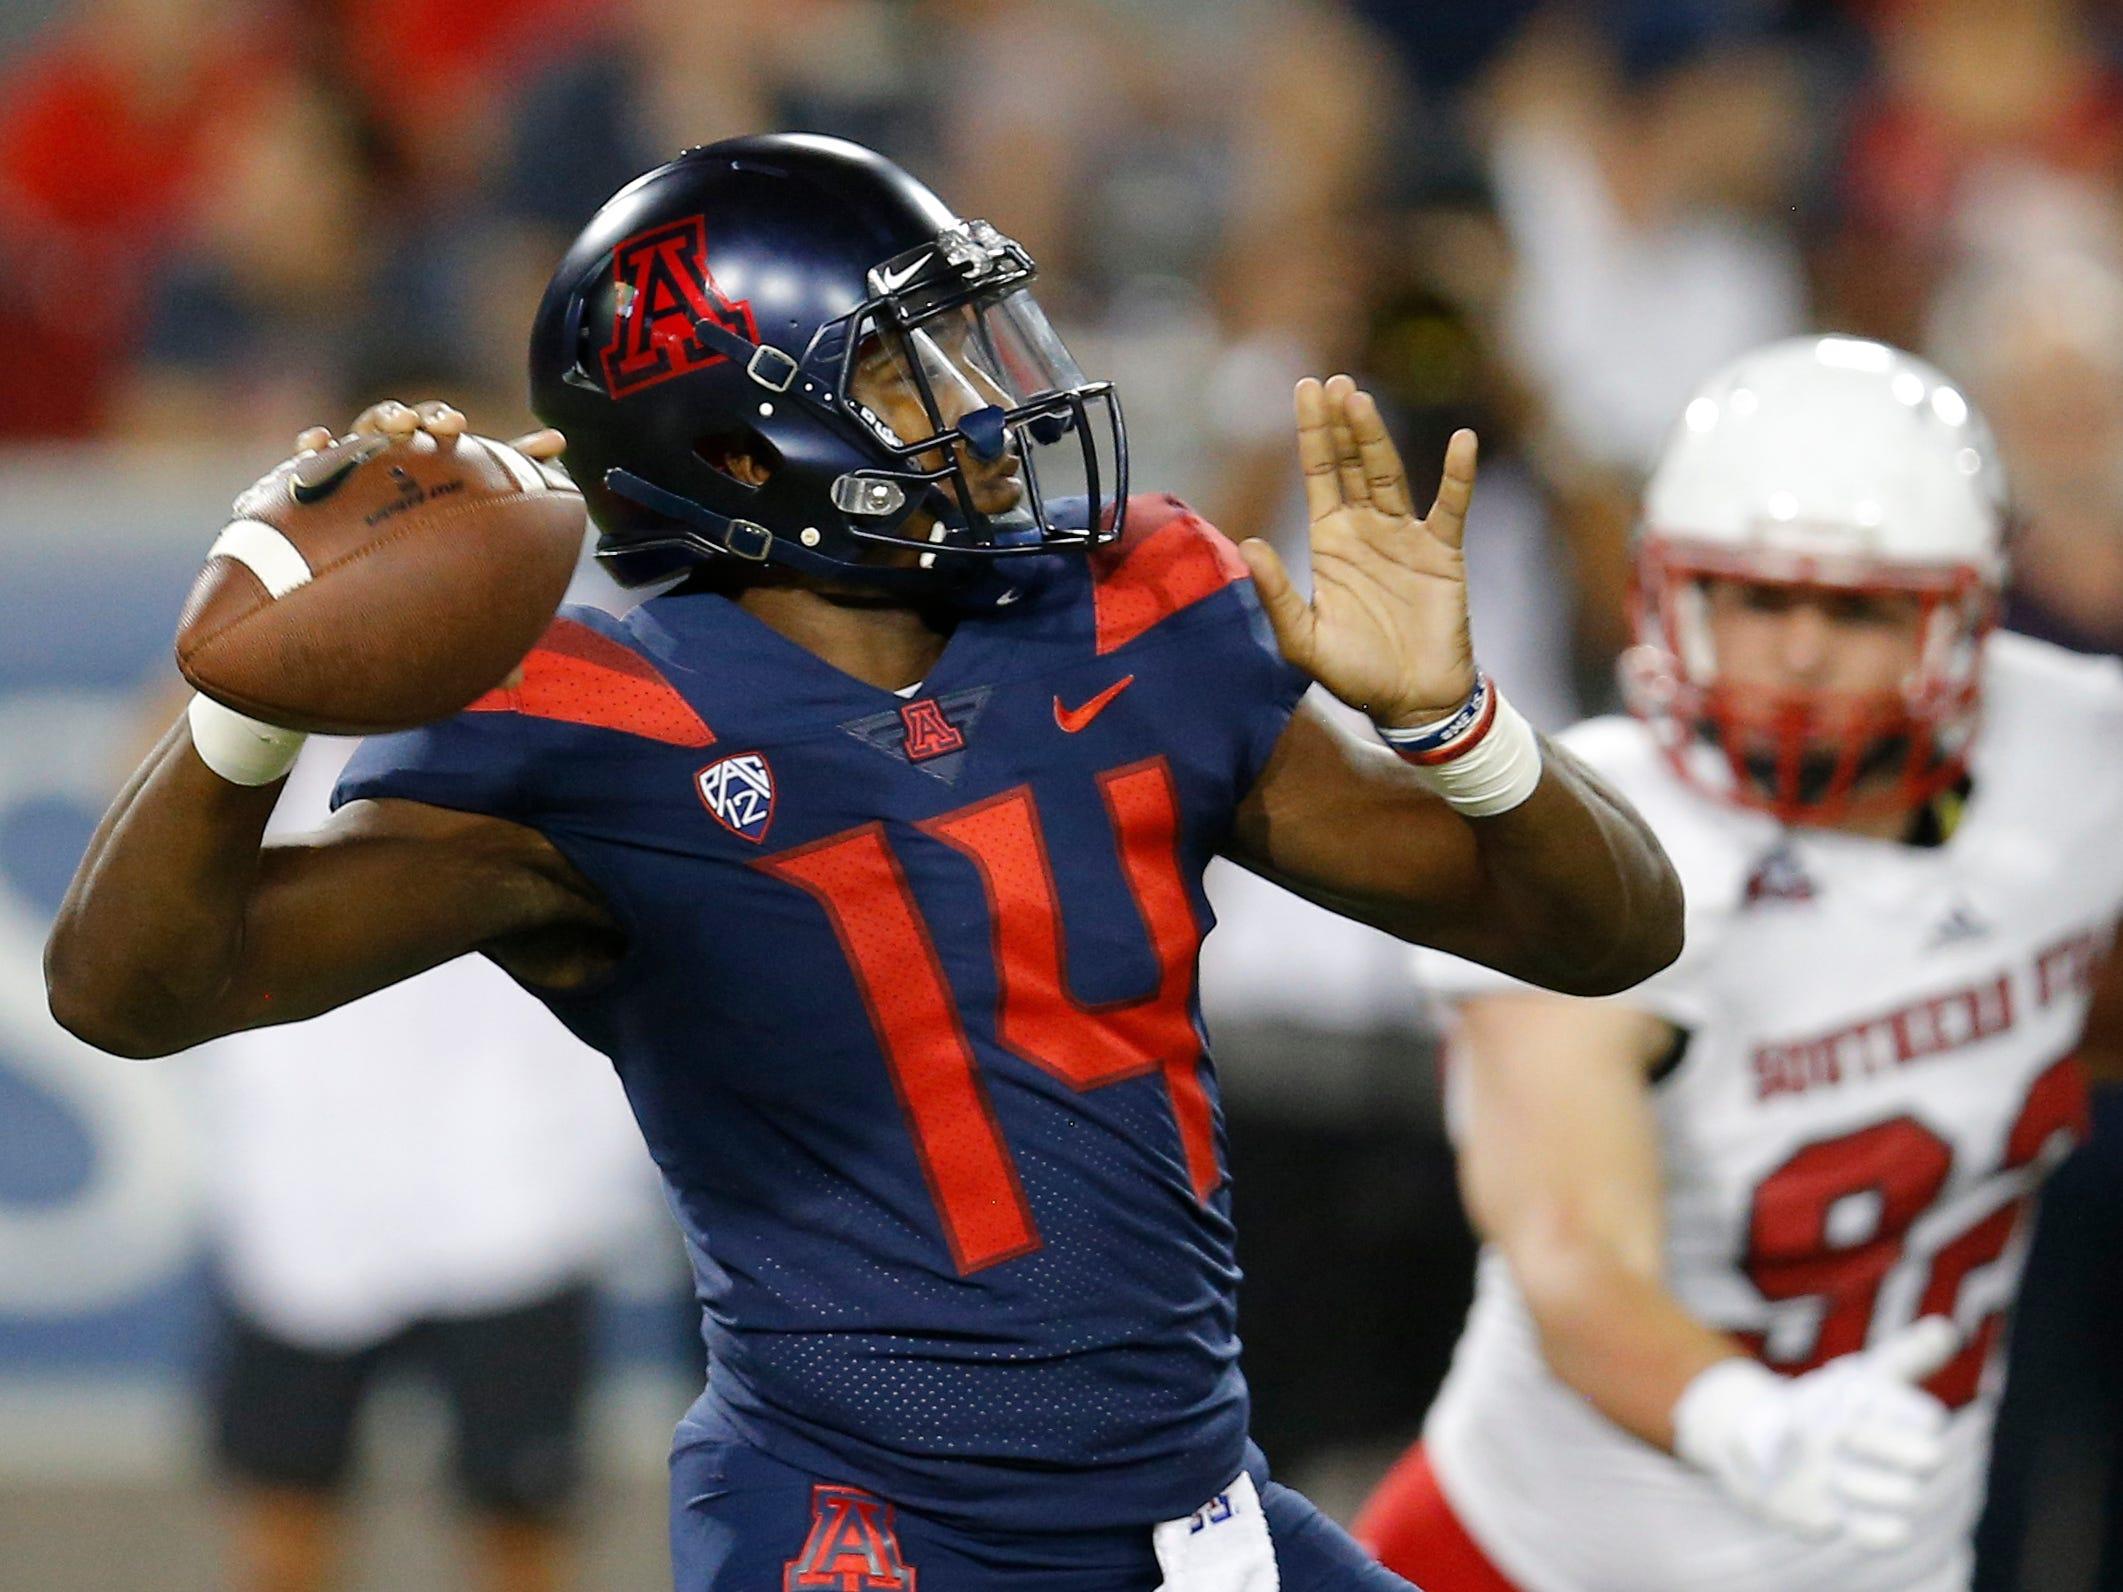 Arizona quarterback Khalil Tate (14) throws downfield against Southern Utah in the first half during an NCAA college football game, Saturday, Sept. 15, 2018, in Tucson, Ariz. (AP Photo/Rick Scuteri)